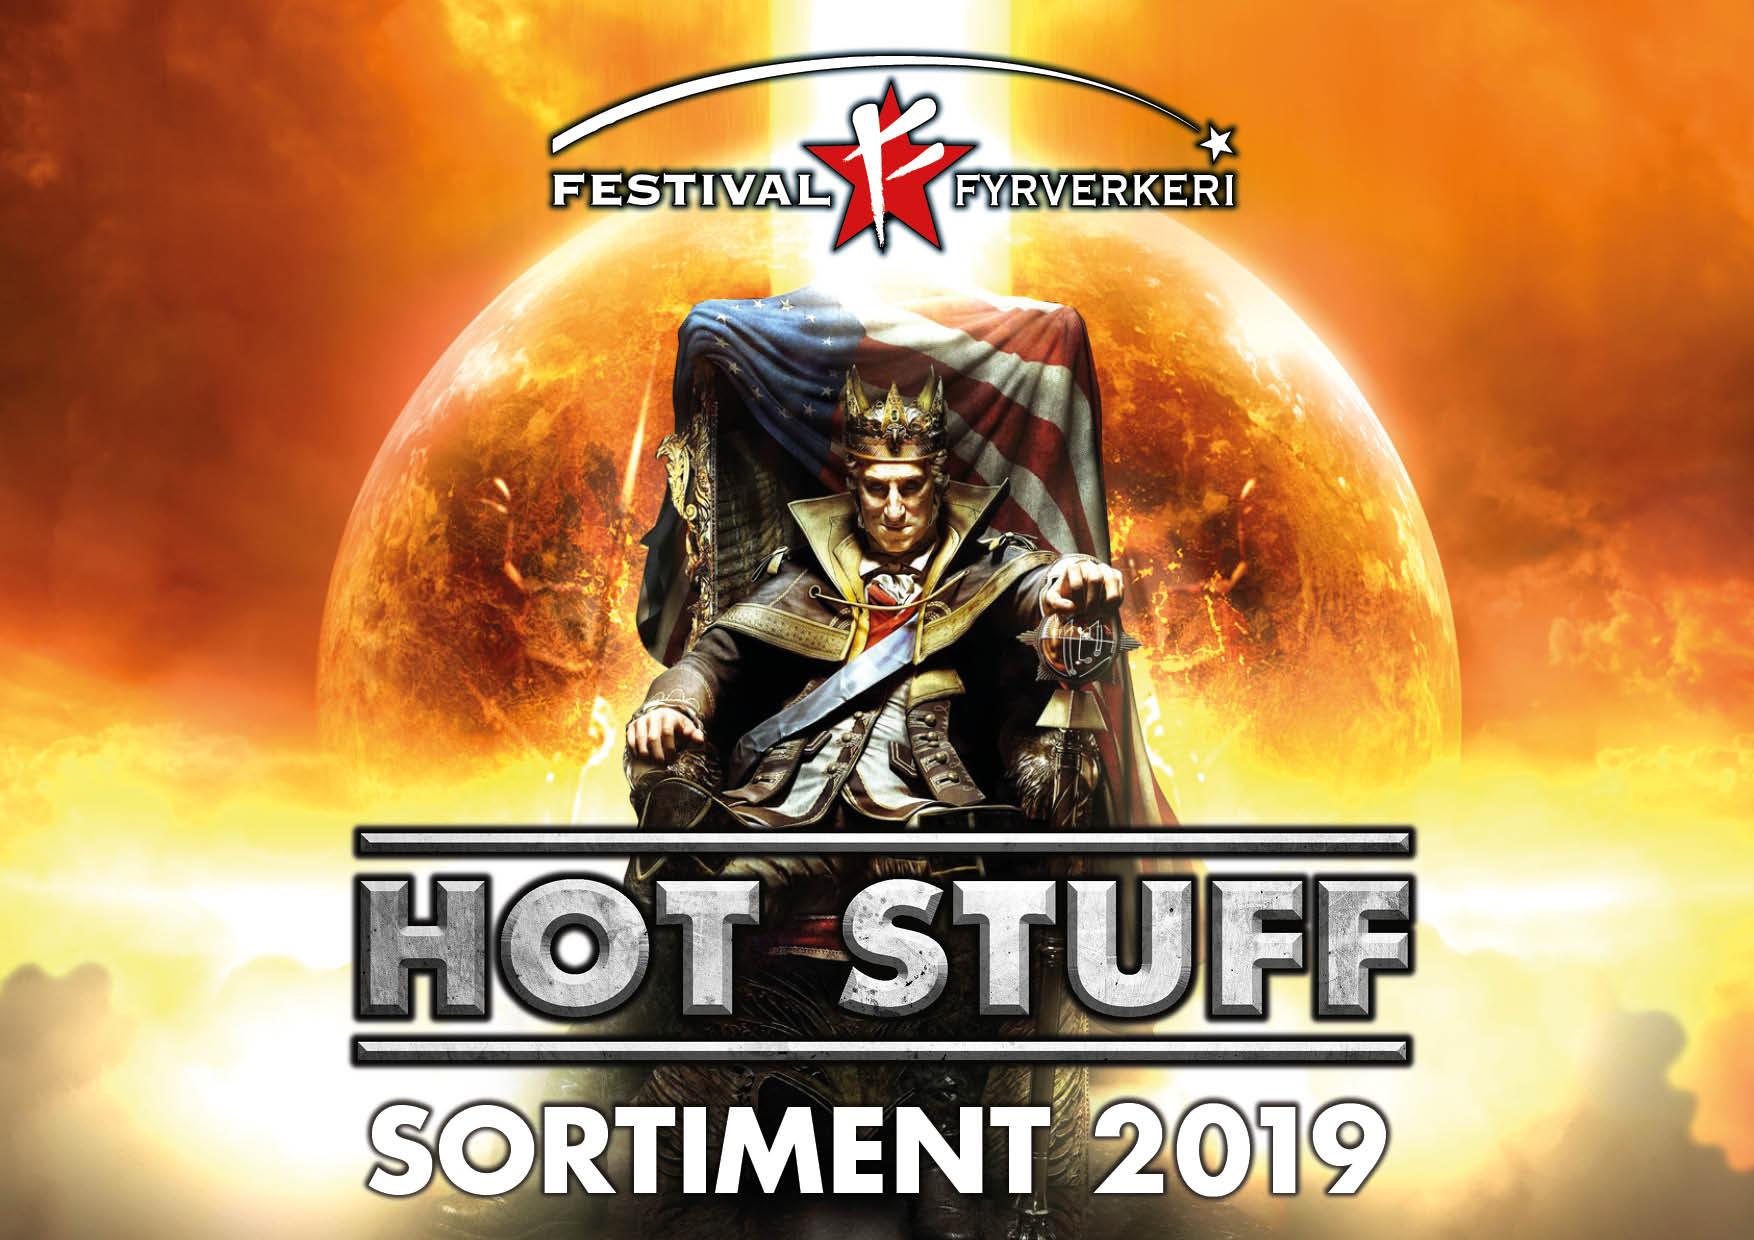 festivalfyrverkeri_hotstuff_1